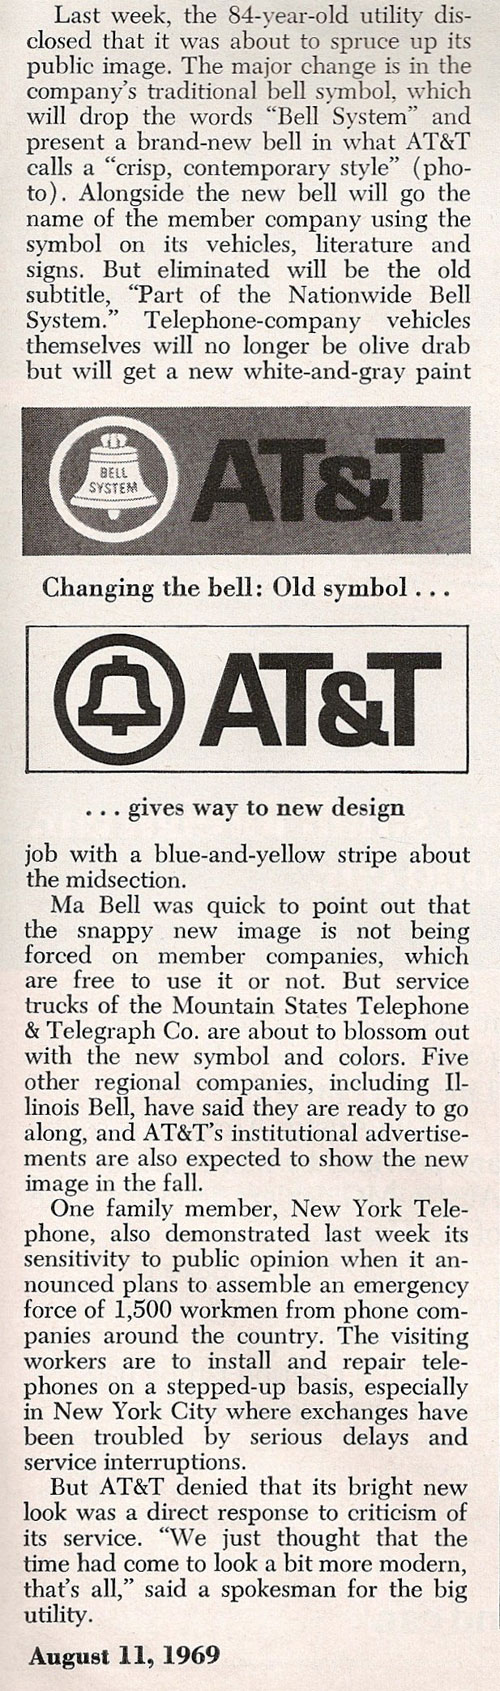 Saul Bass Bell System newspaper clipping